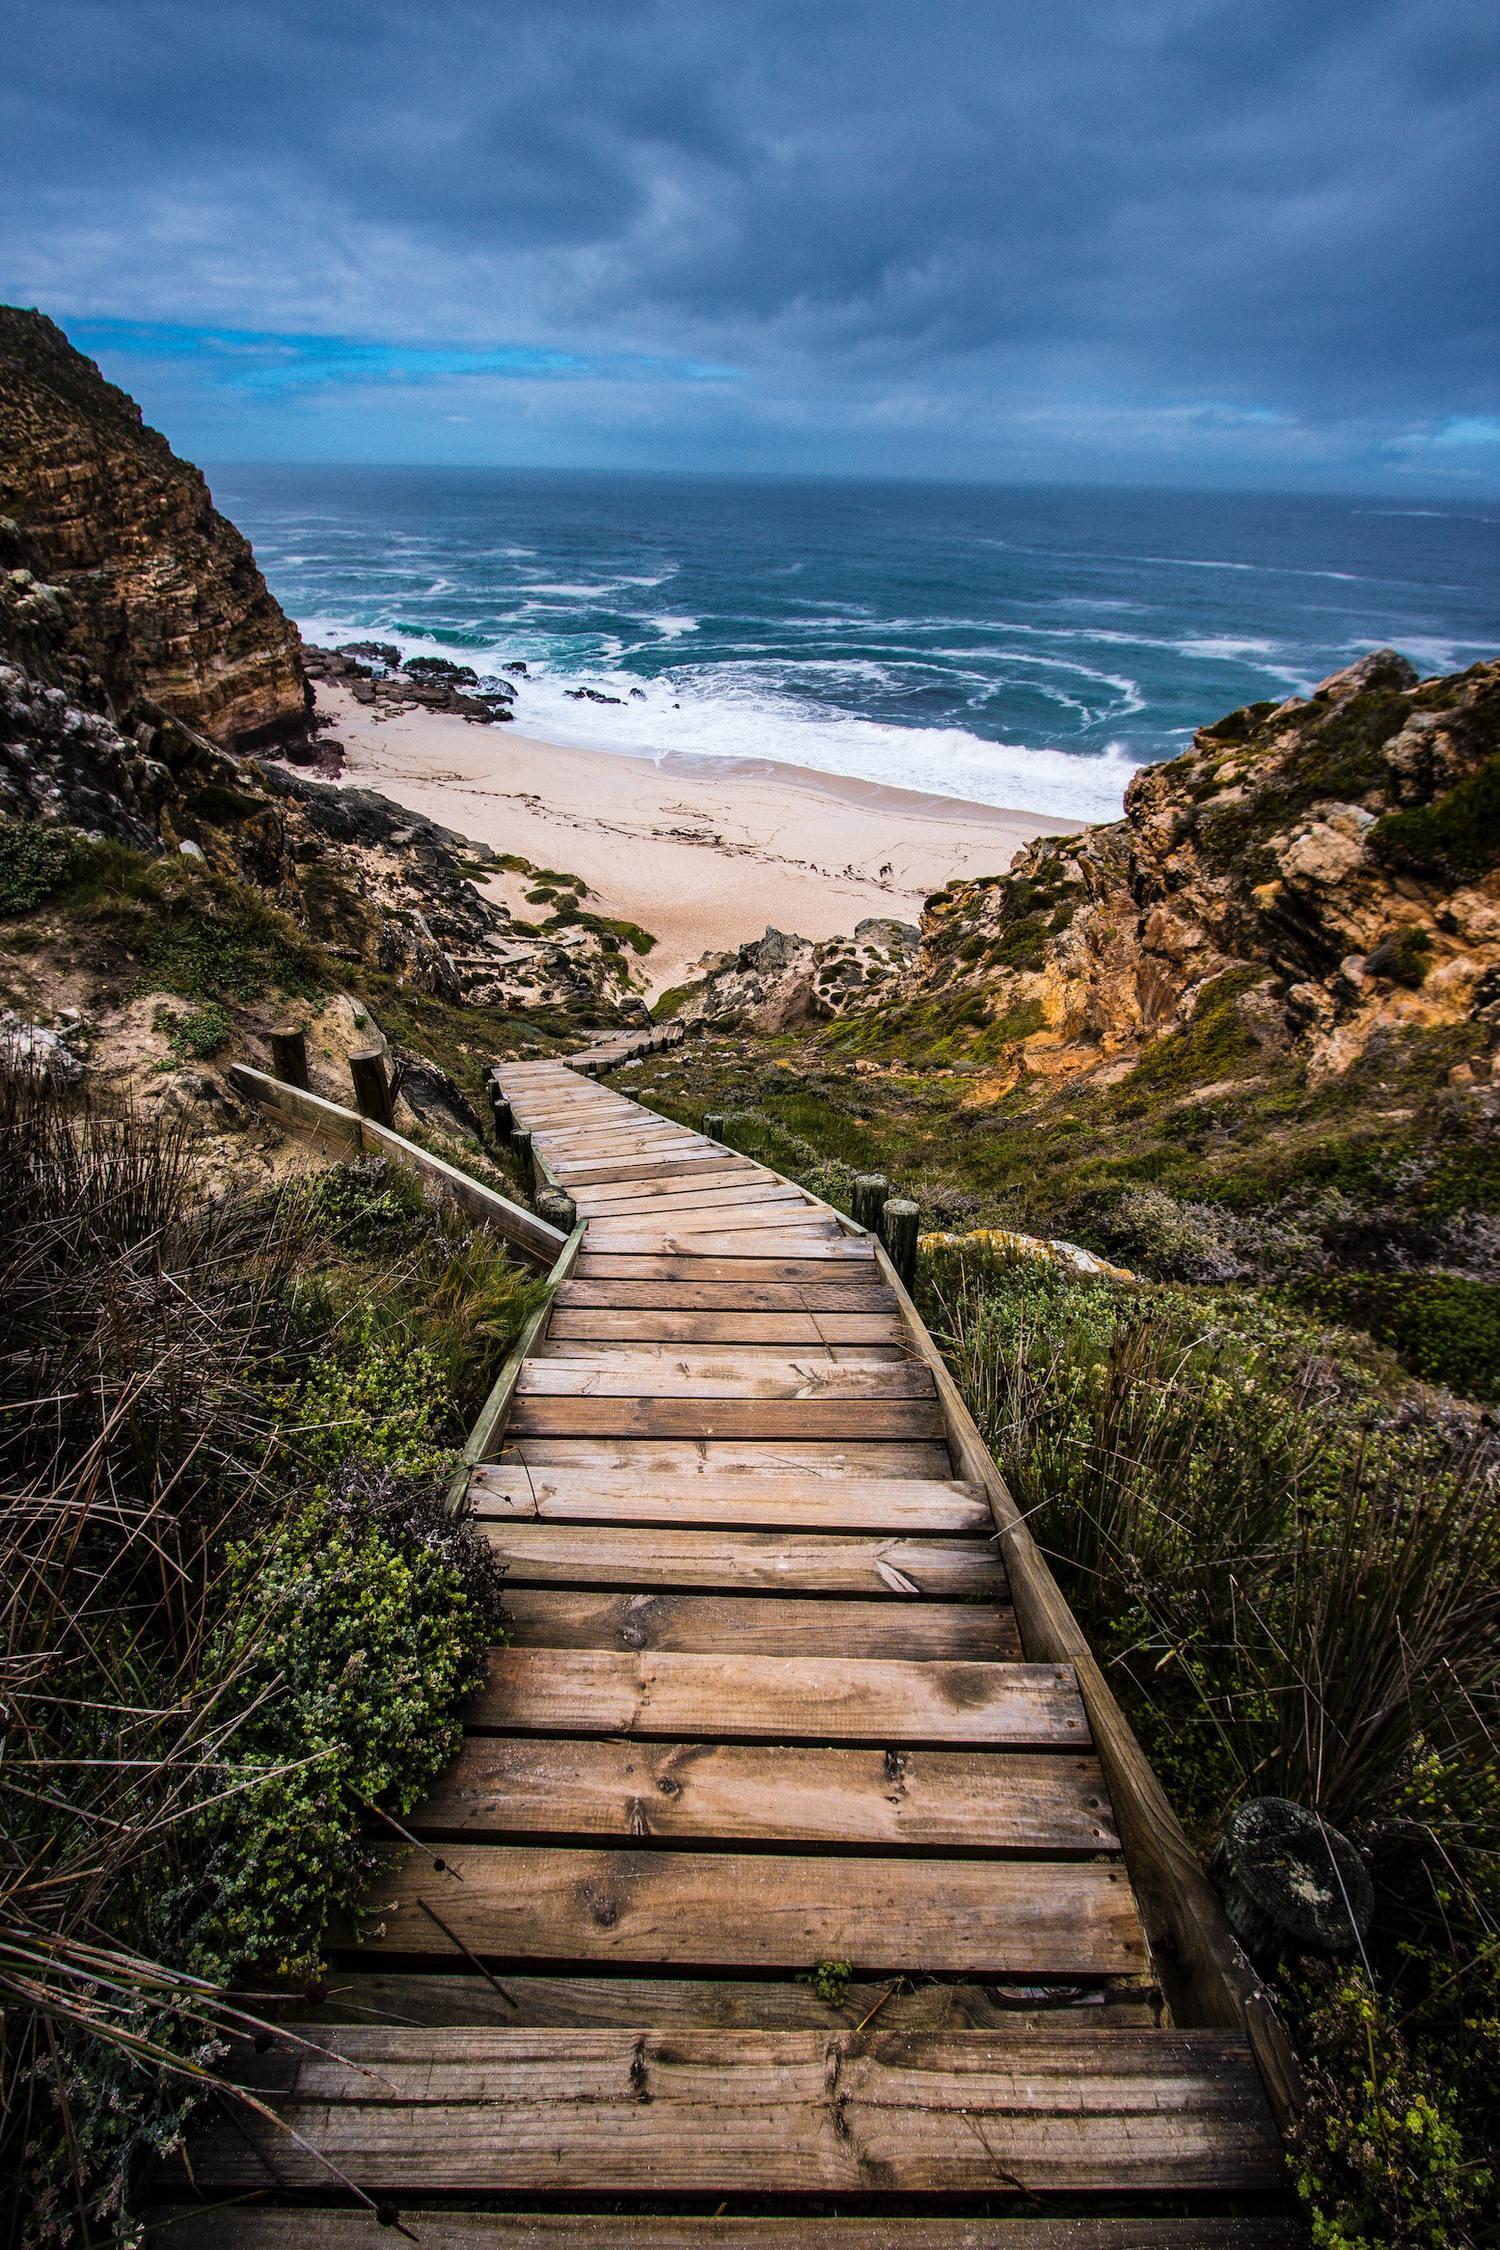 Camino de madera al mar